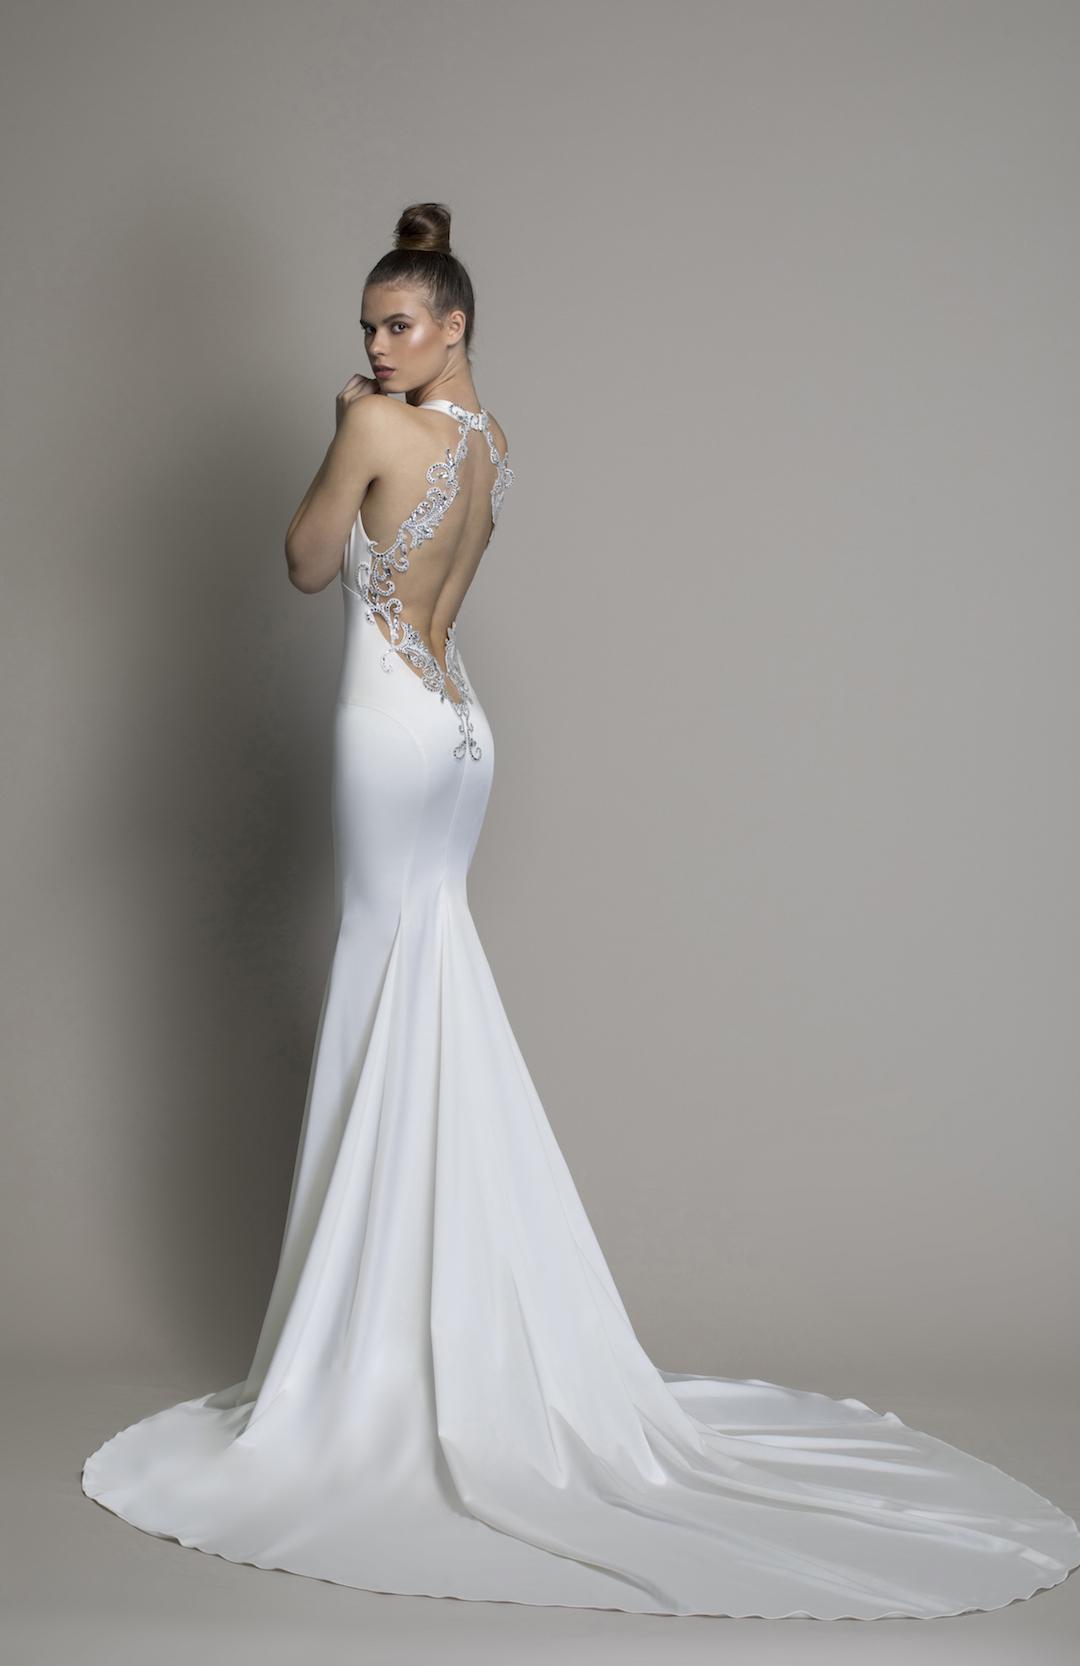 459d9f7f8cb Sheath Satin V-neck Wedding Dress